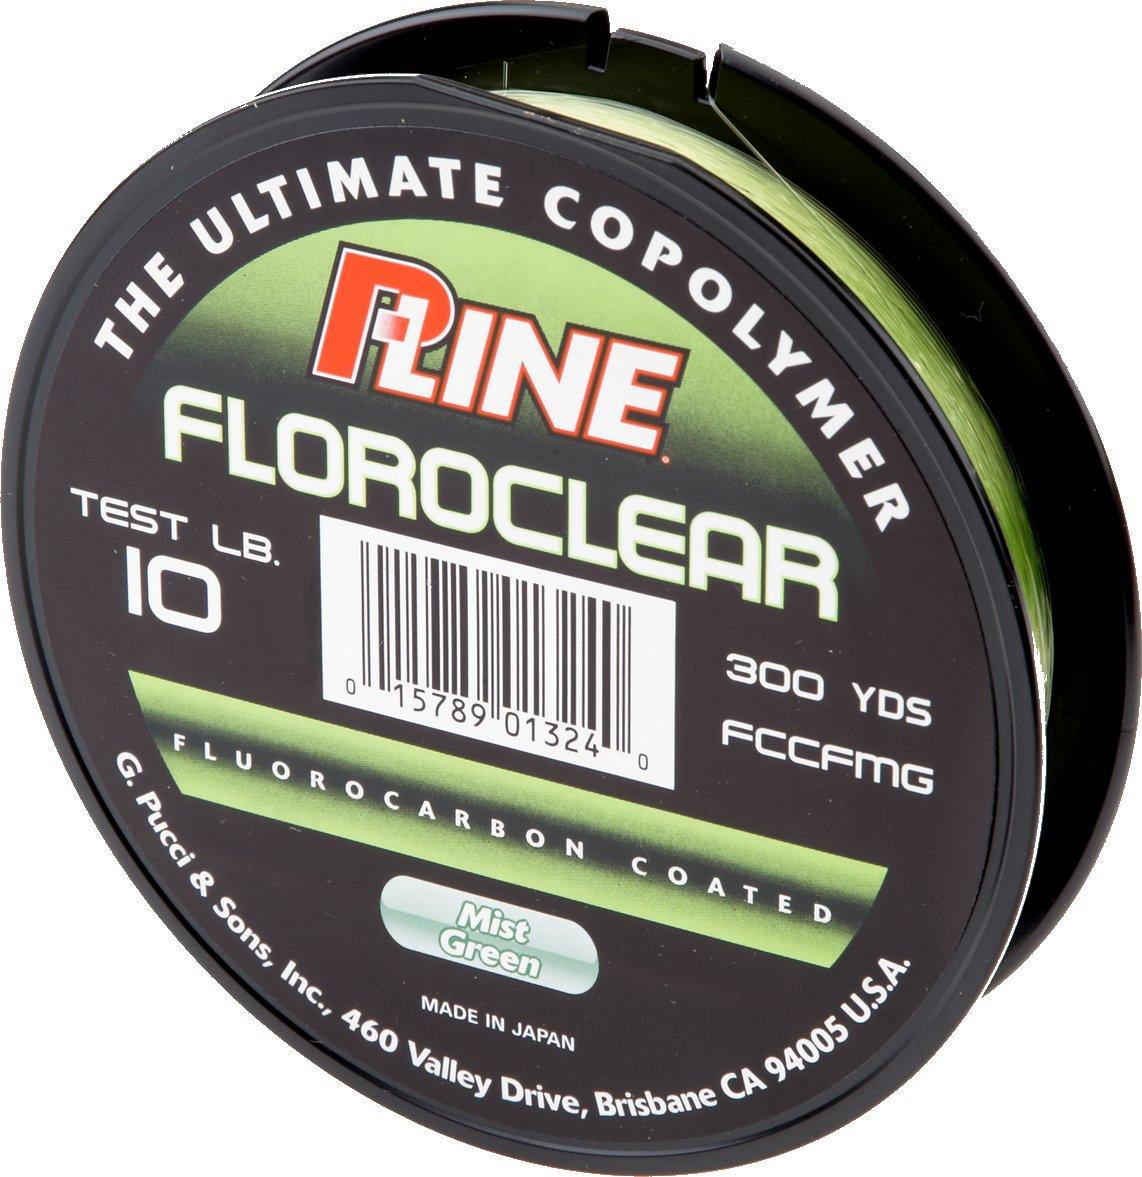 P-Line® Floroclear 10 lb. - 300 yards Fluorocarbon